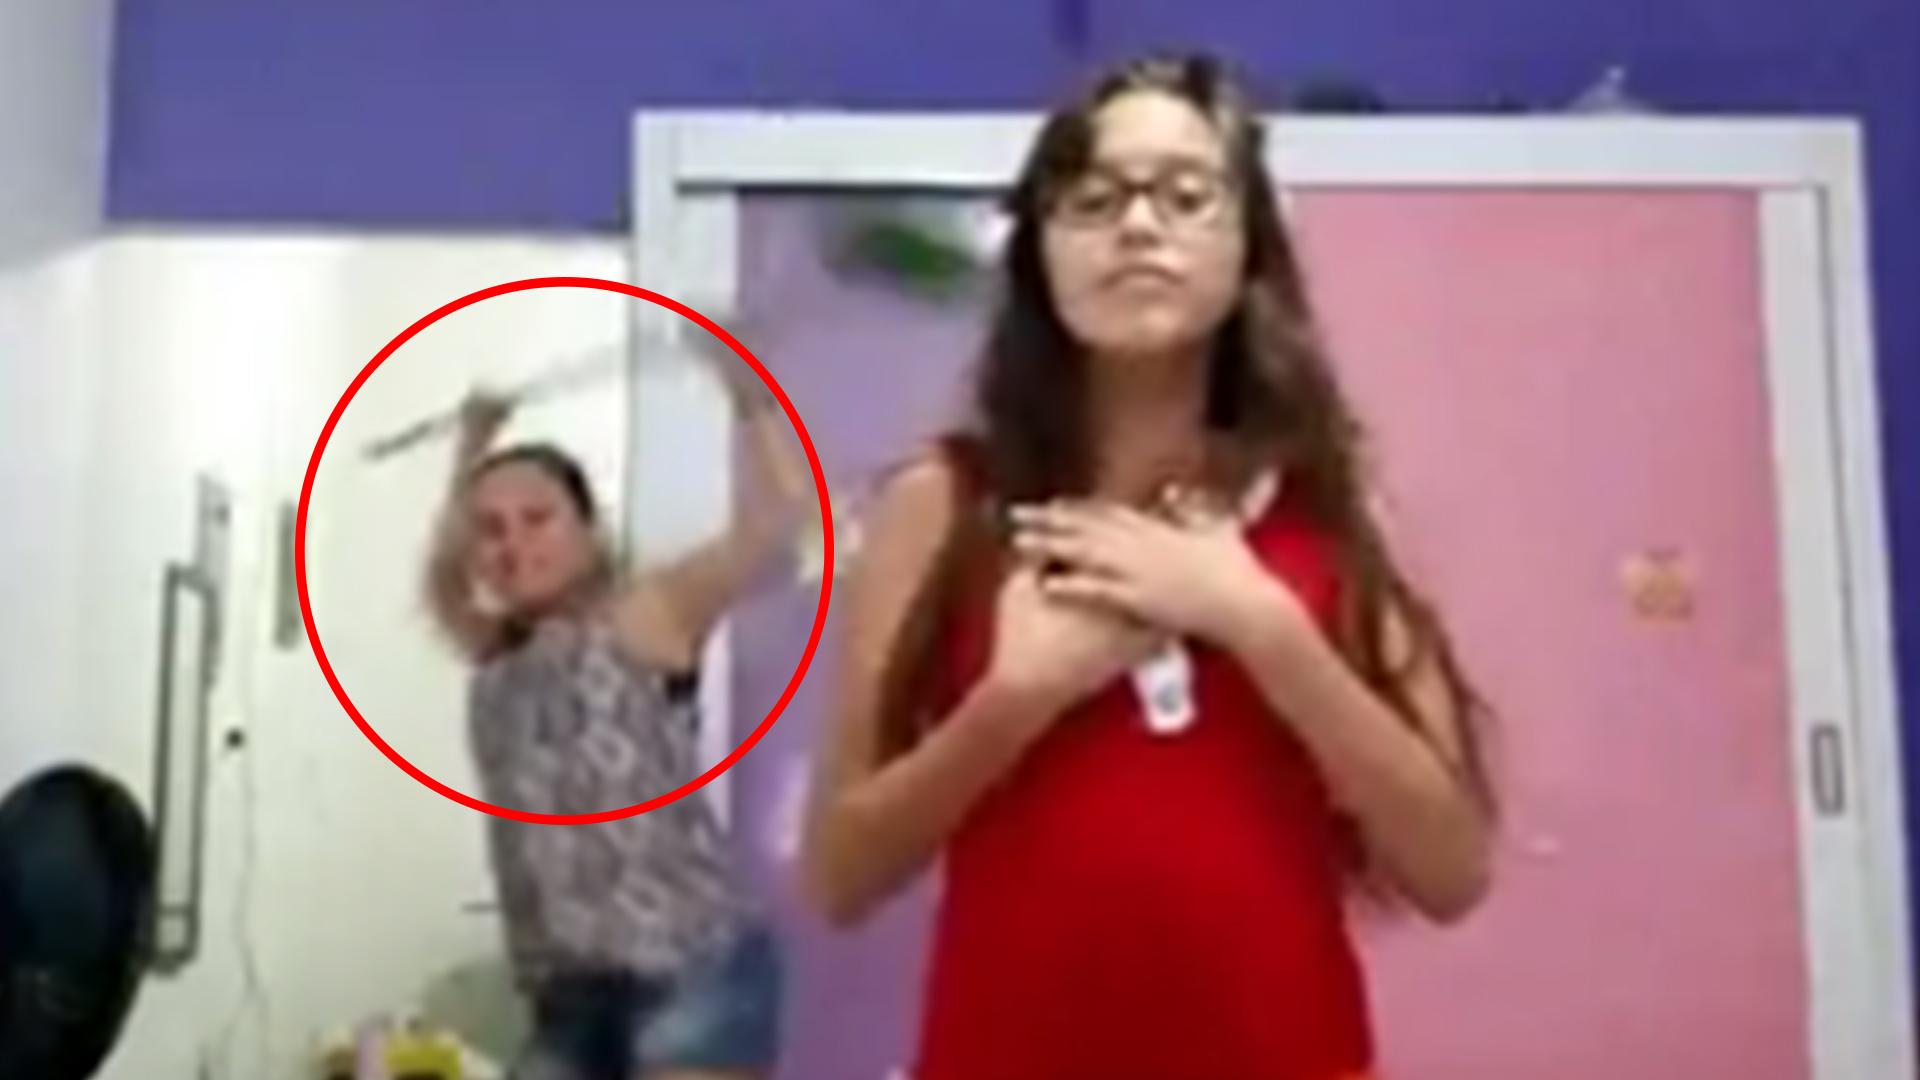 Monja adolescente de la iglesia se masturba hasta eyacular video full httpsouoioaa2ojo - 4 8